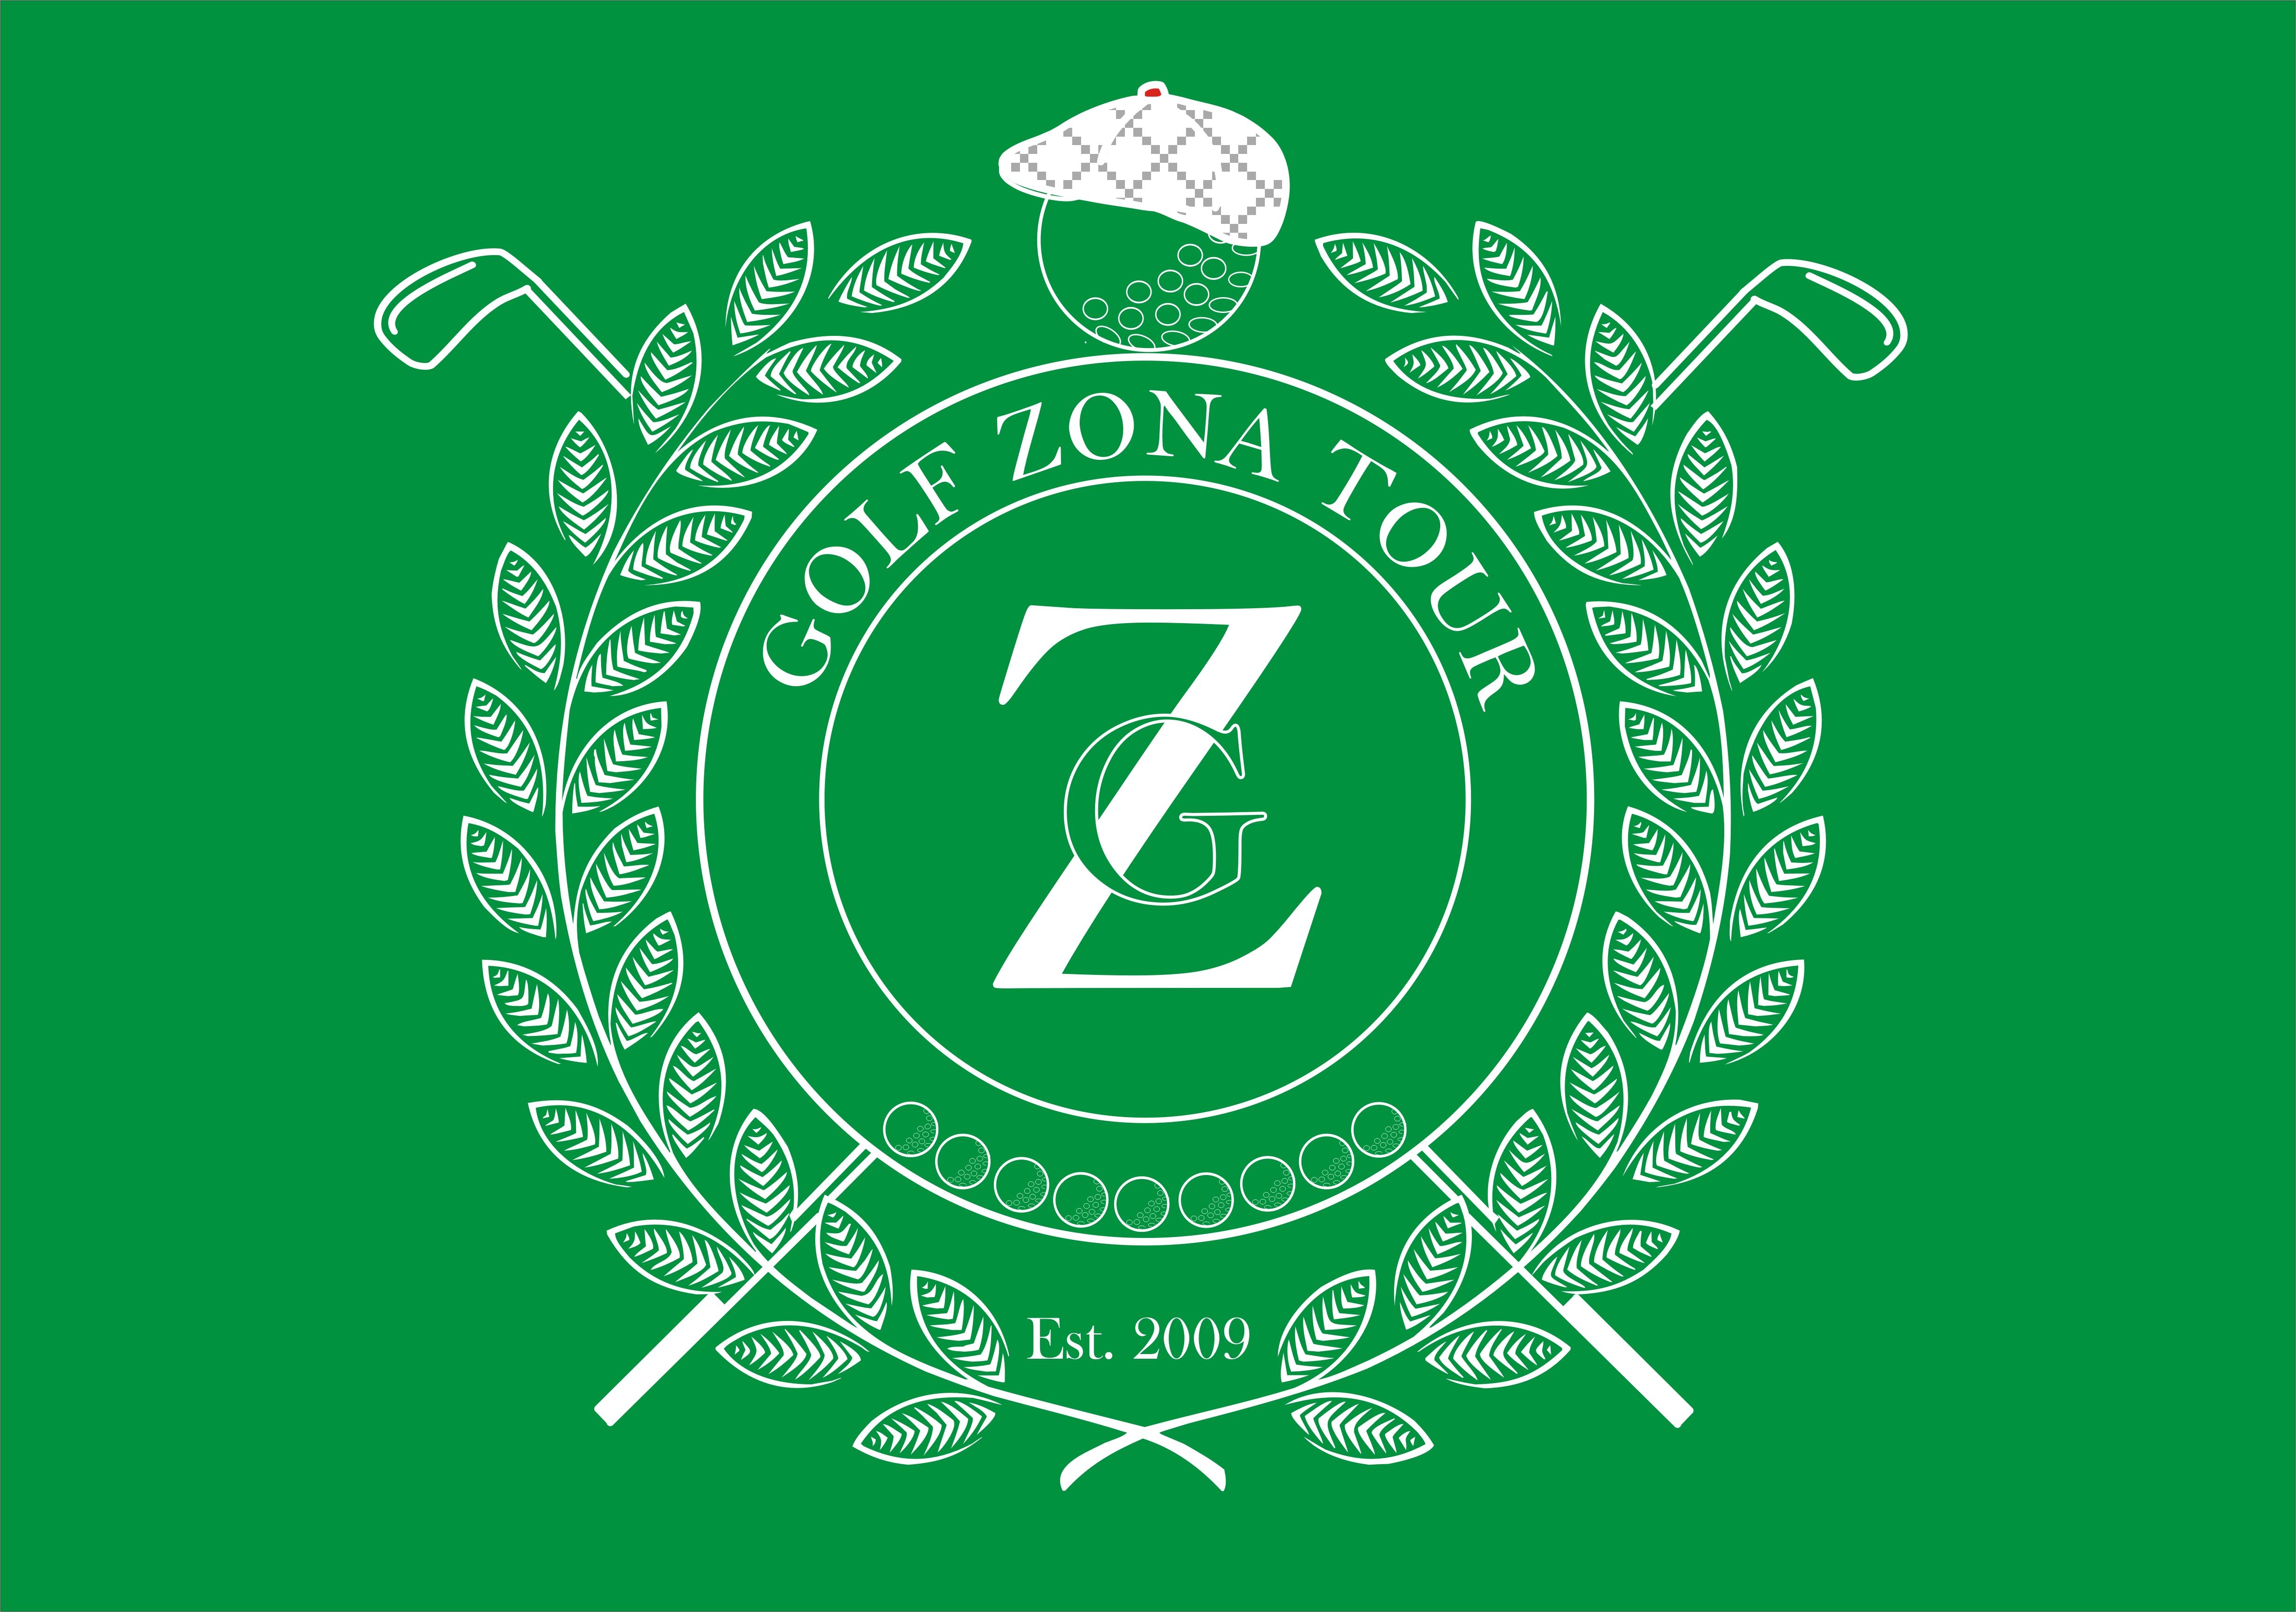 Logo GZT 2017 biele na zelenom podklade